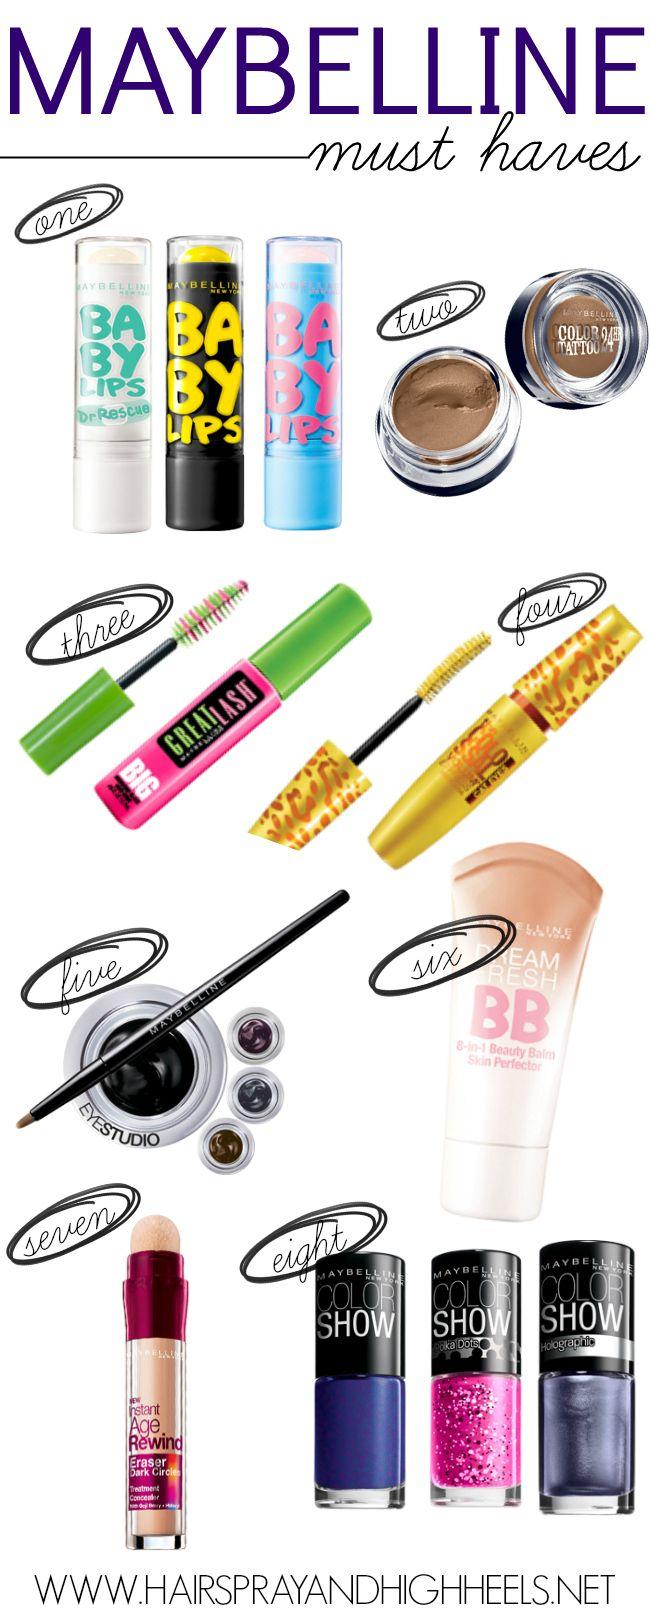 1-baby lips 2-color tatoo 3-great lash mascara 4-collasal mascara 5-gel eyeliner 6-dream fresh bb cream 7-age rewind dark cicle remover 8-show nail polish